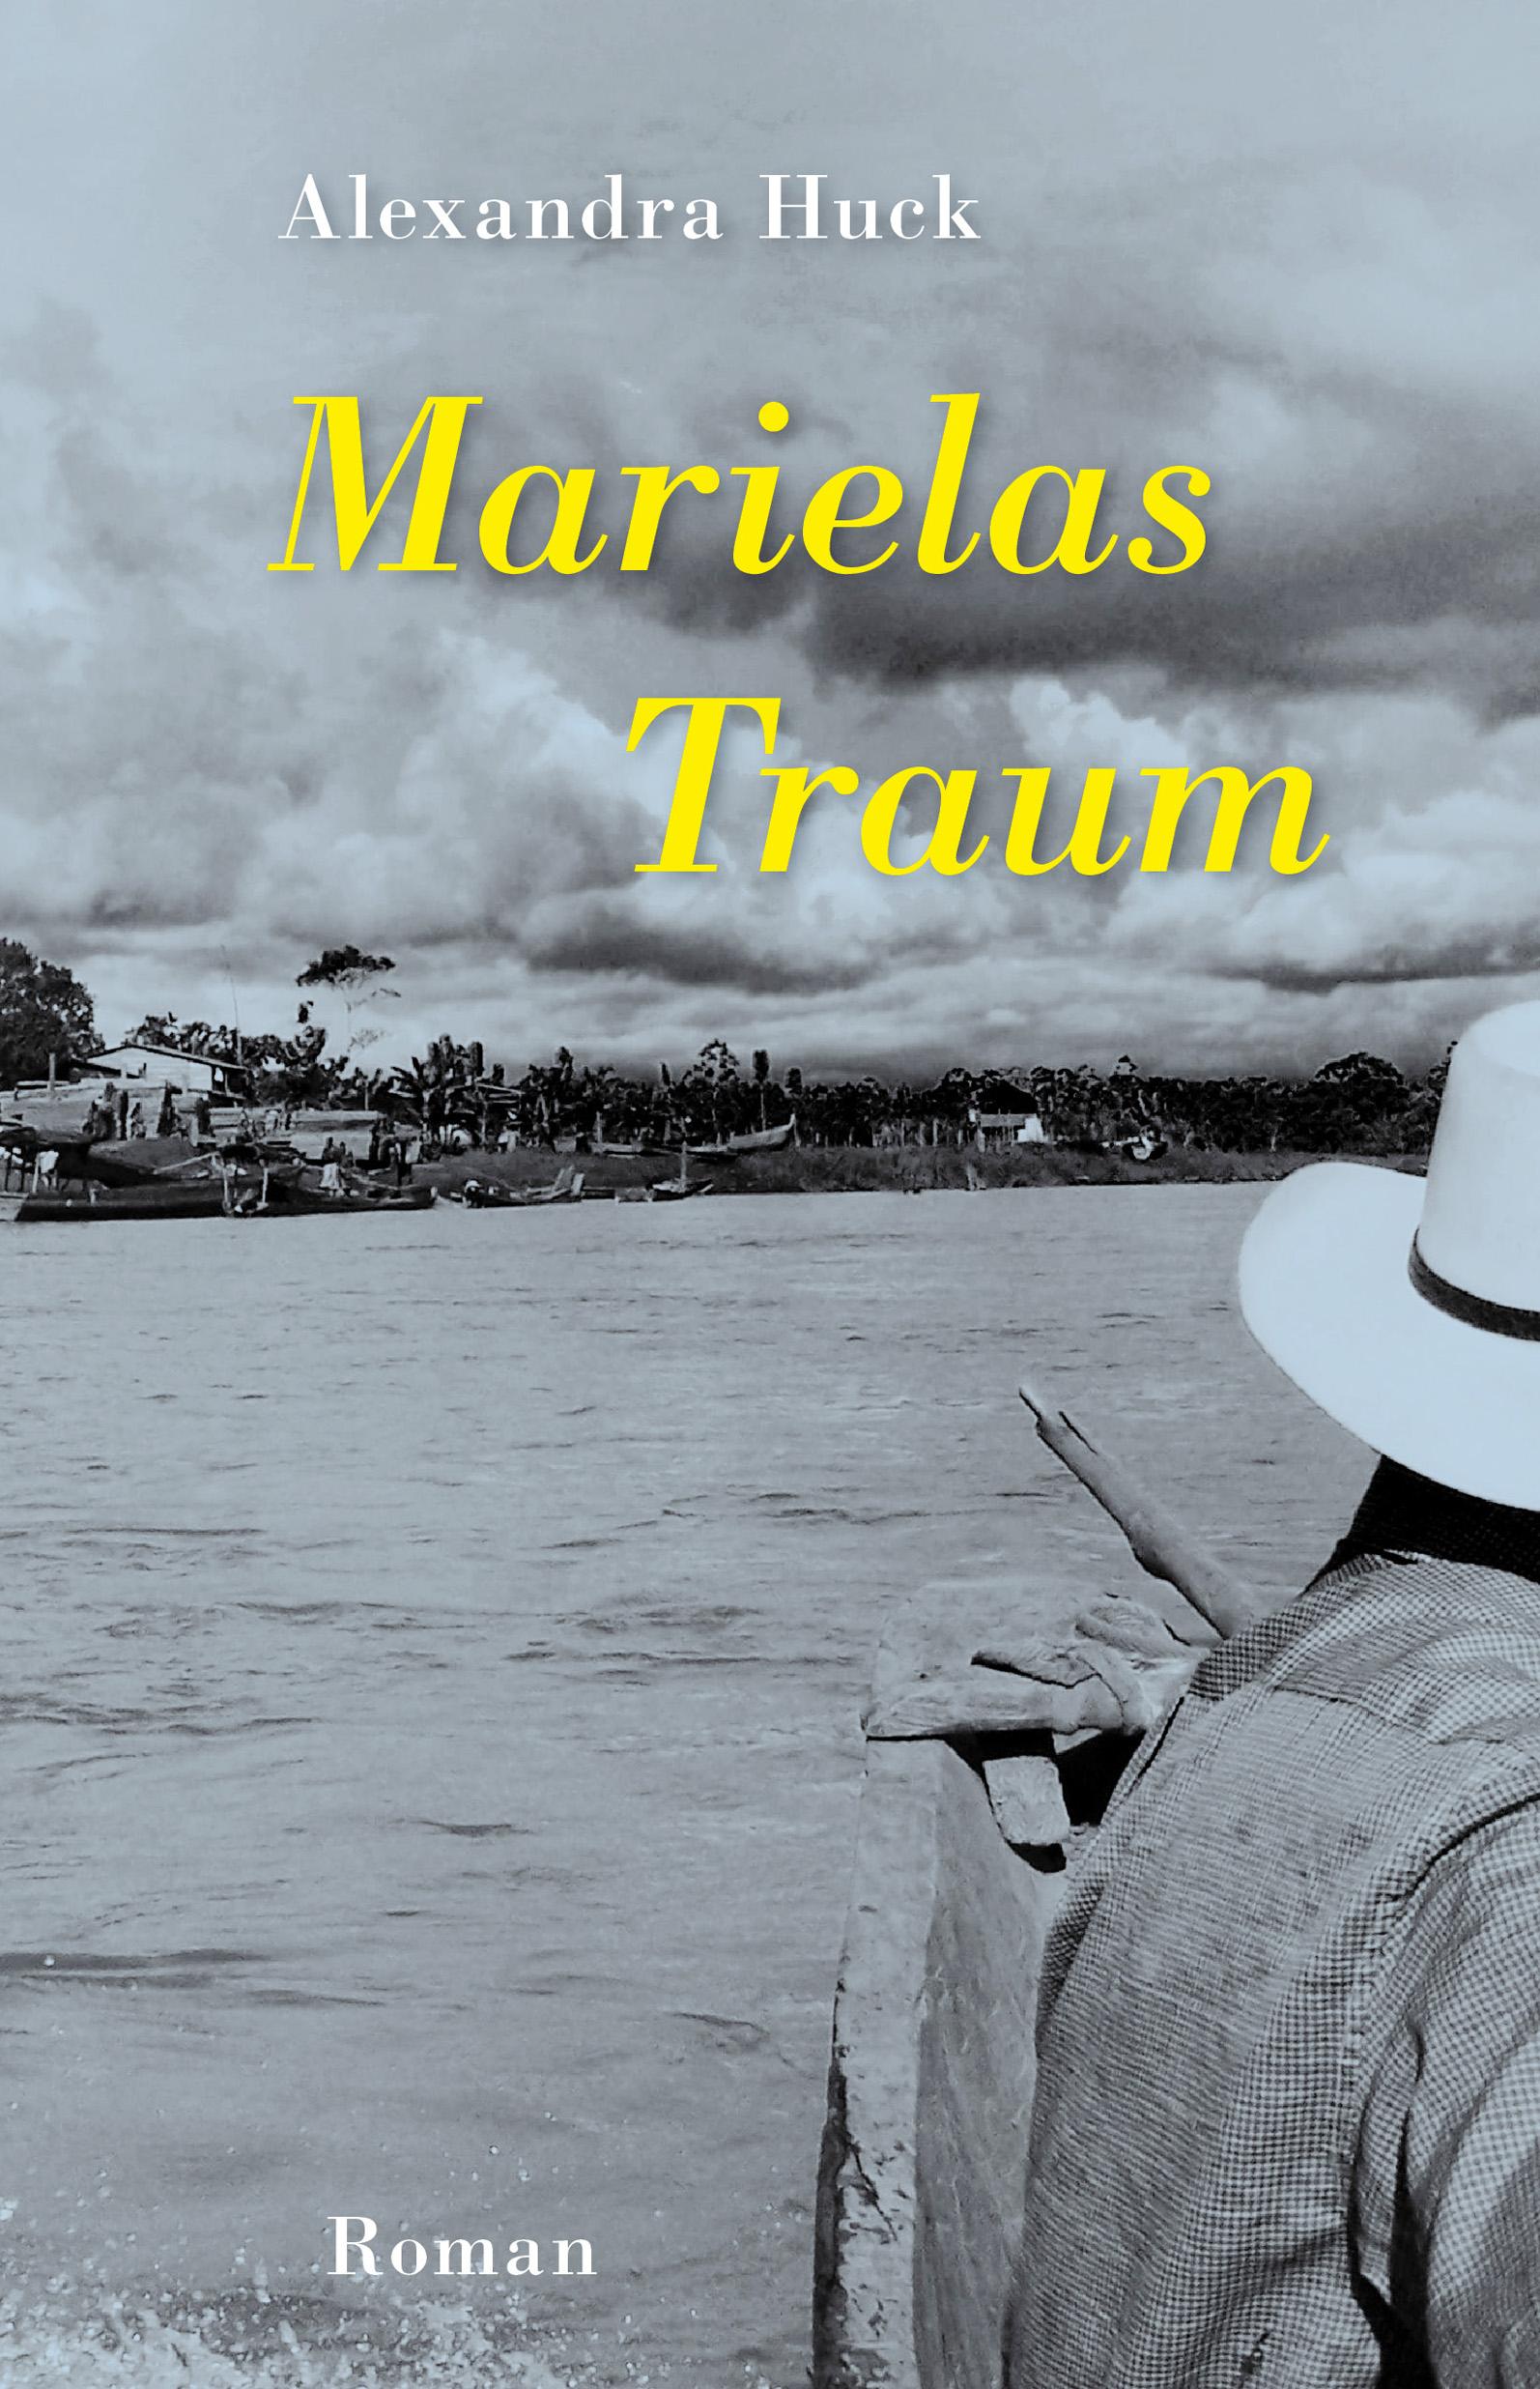 u1_huck_marielas_traum_2